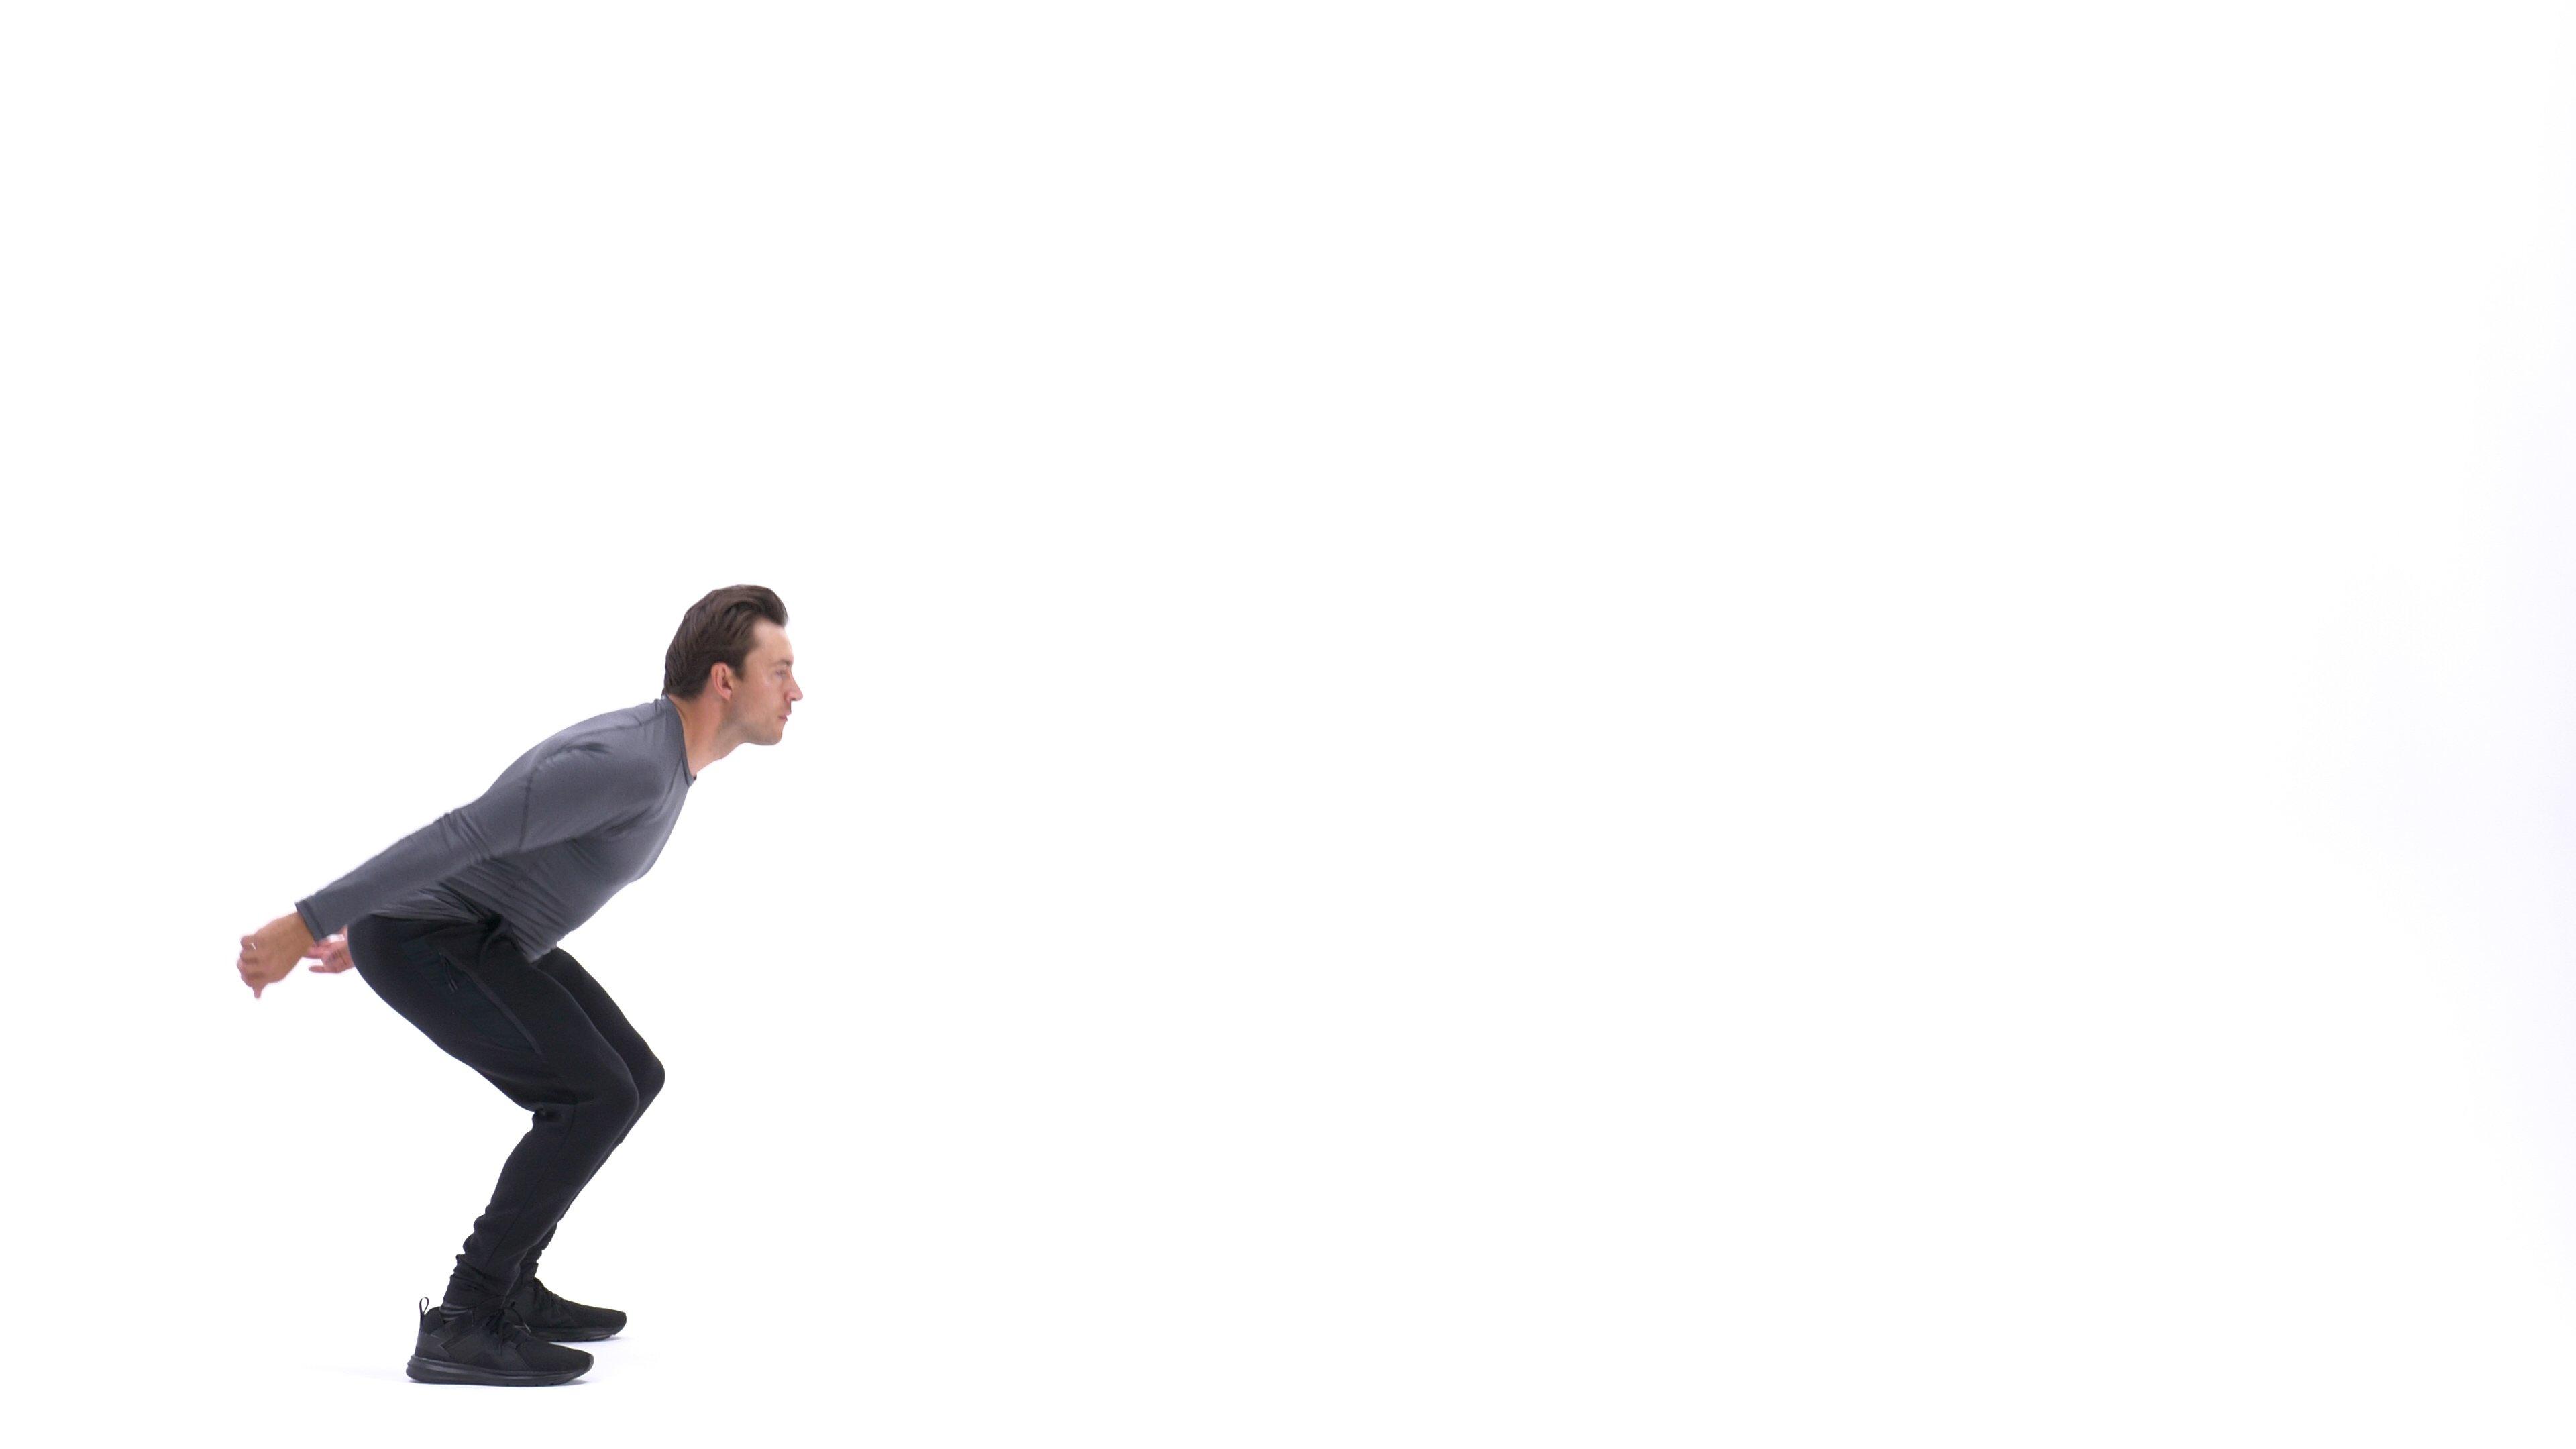 Broad jump image